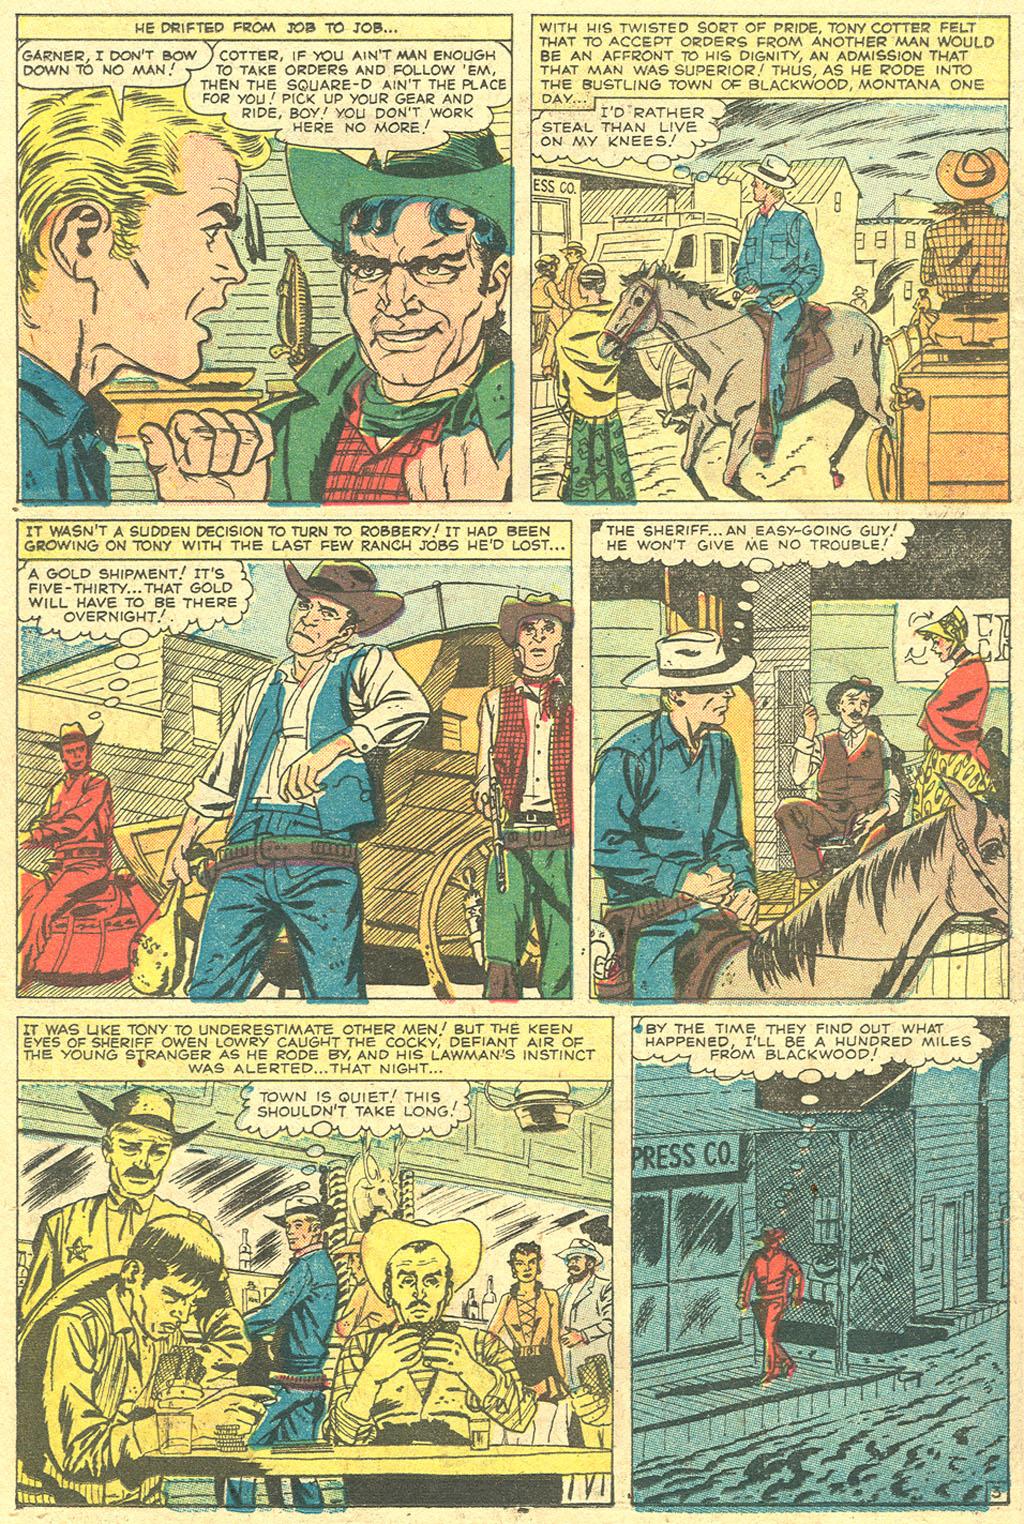 Read online Two-Gun Kid comic -  Issue #44 - 22